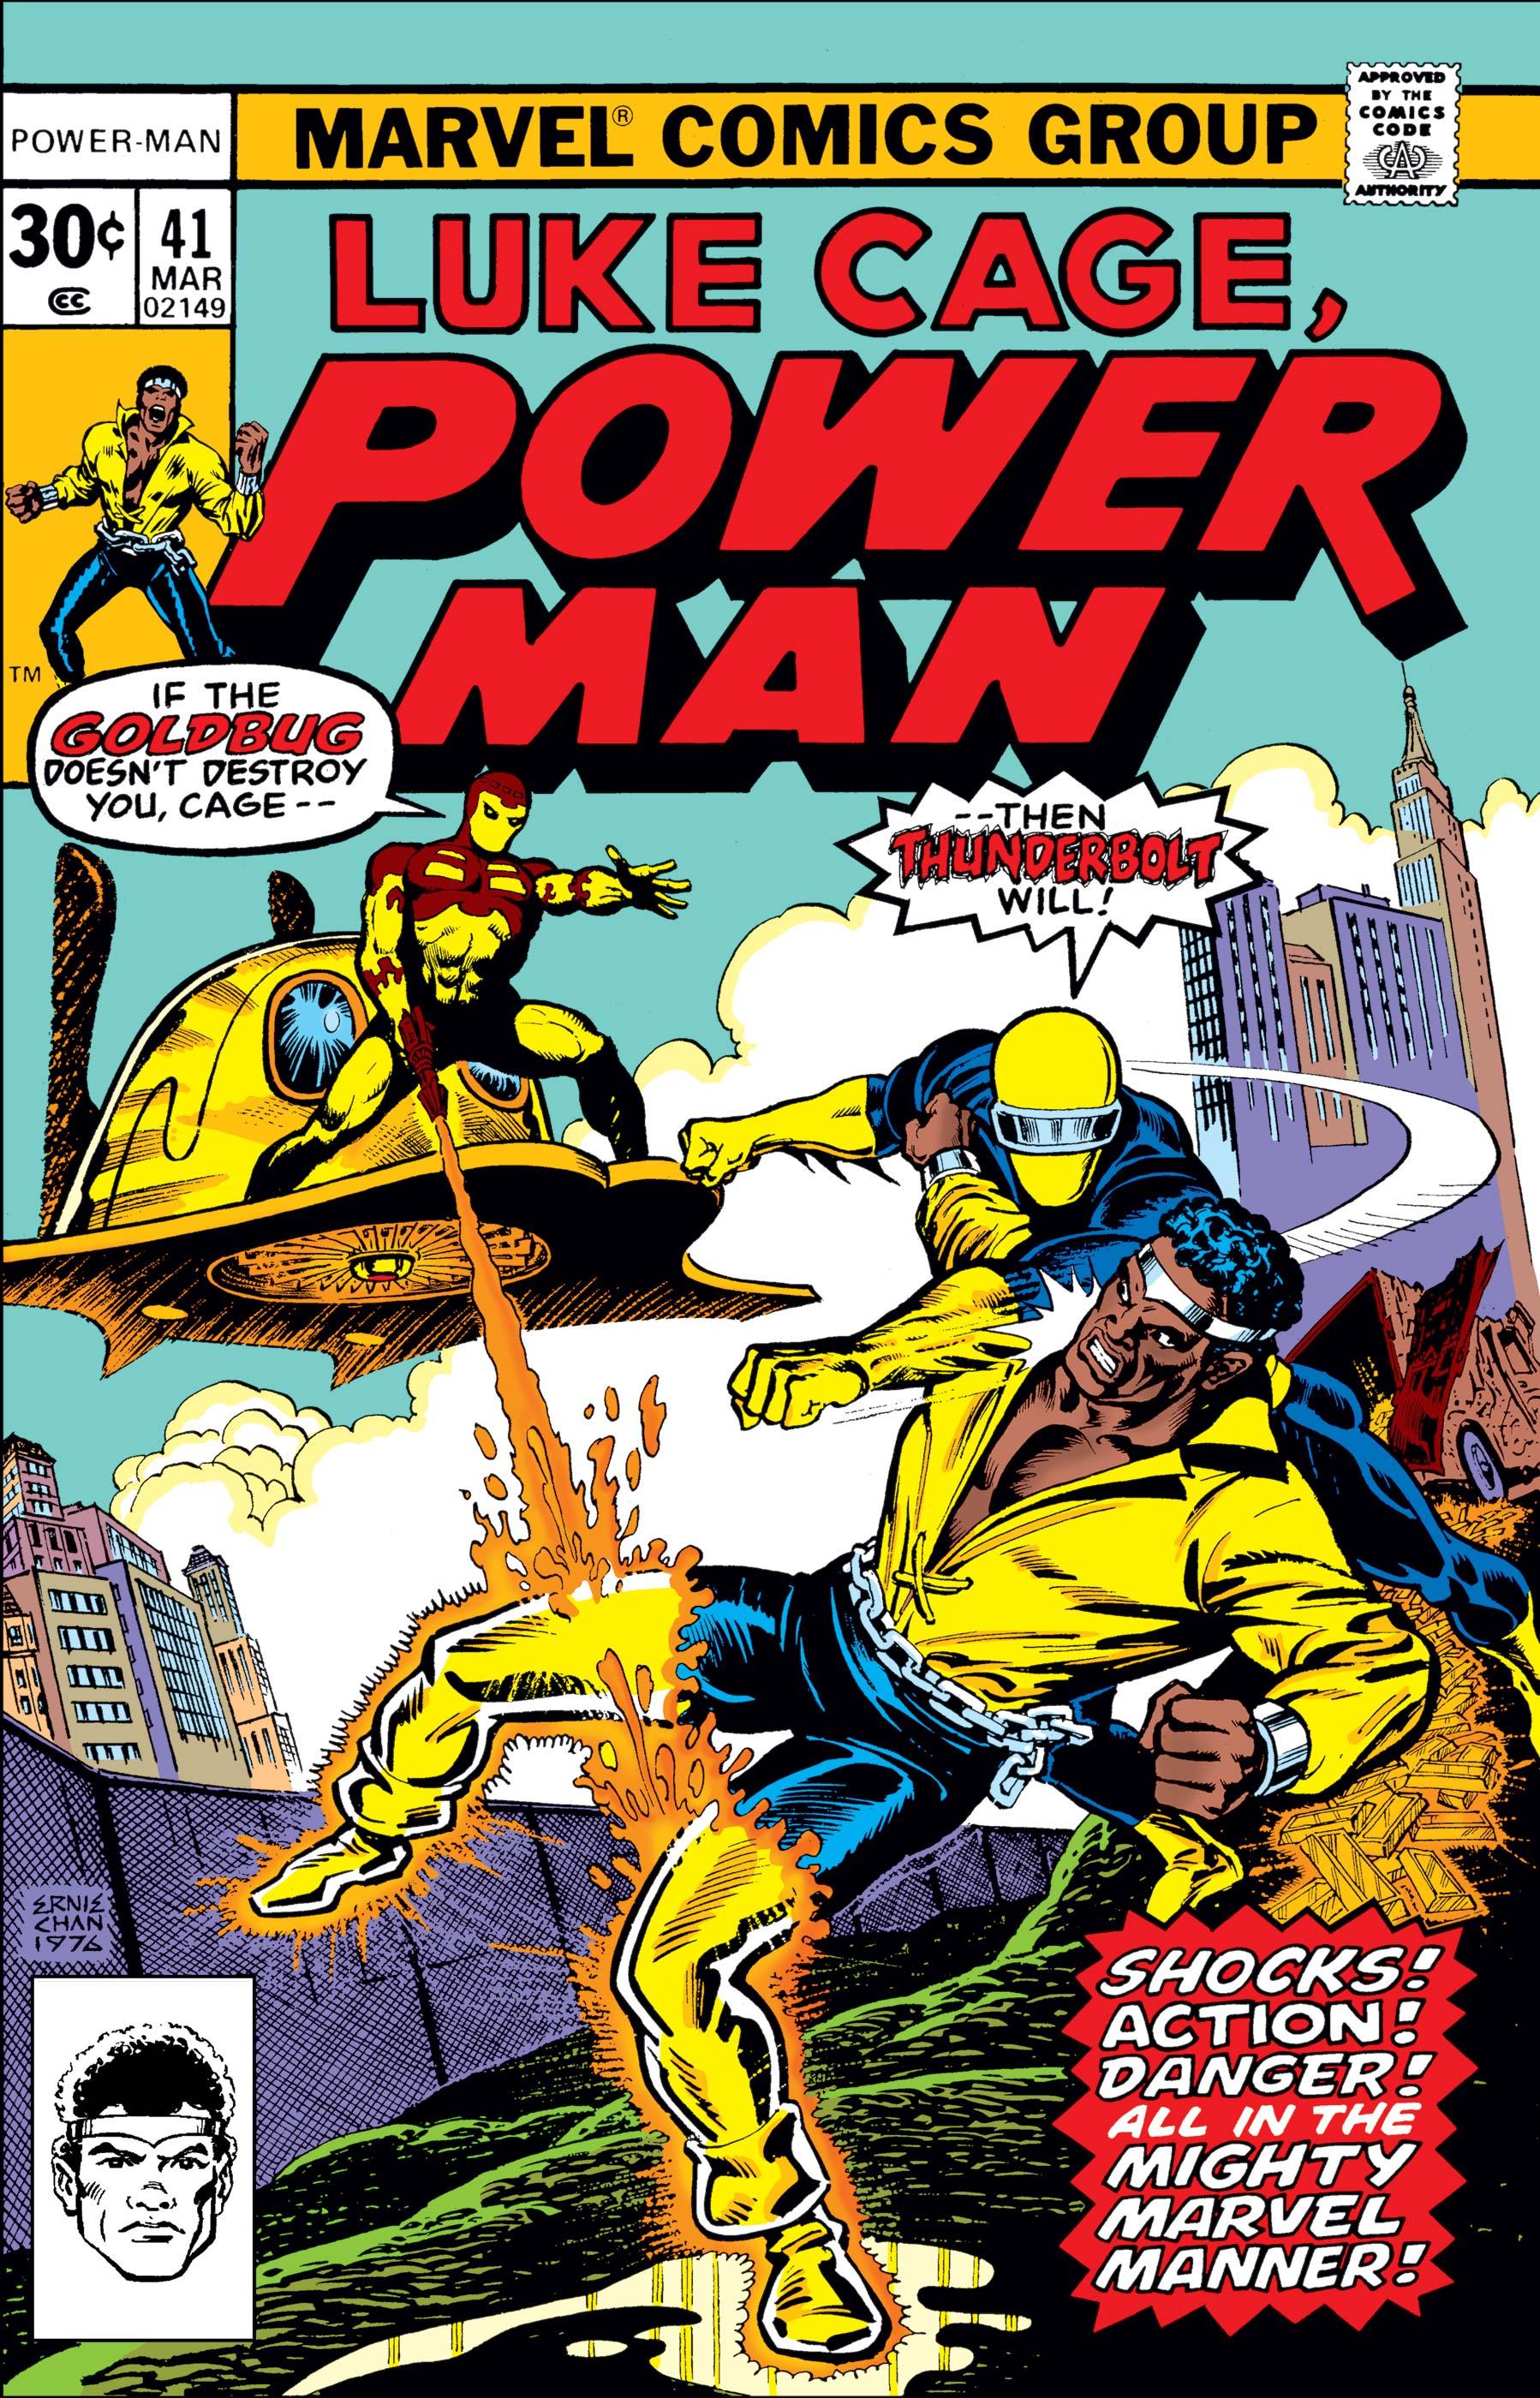 Power Man (1974) #41